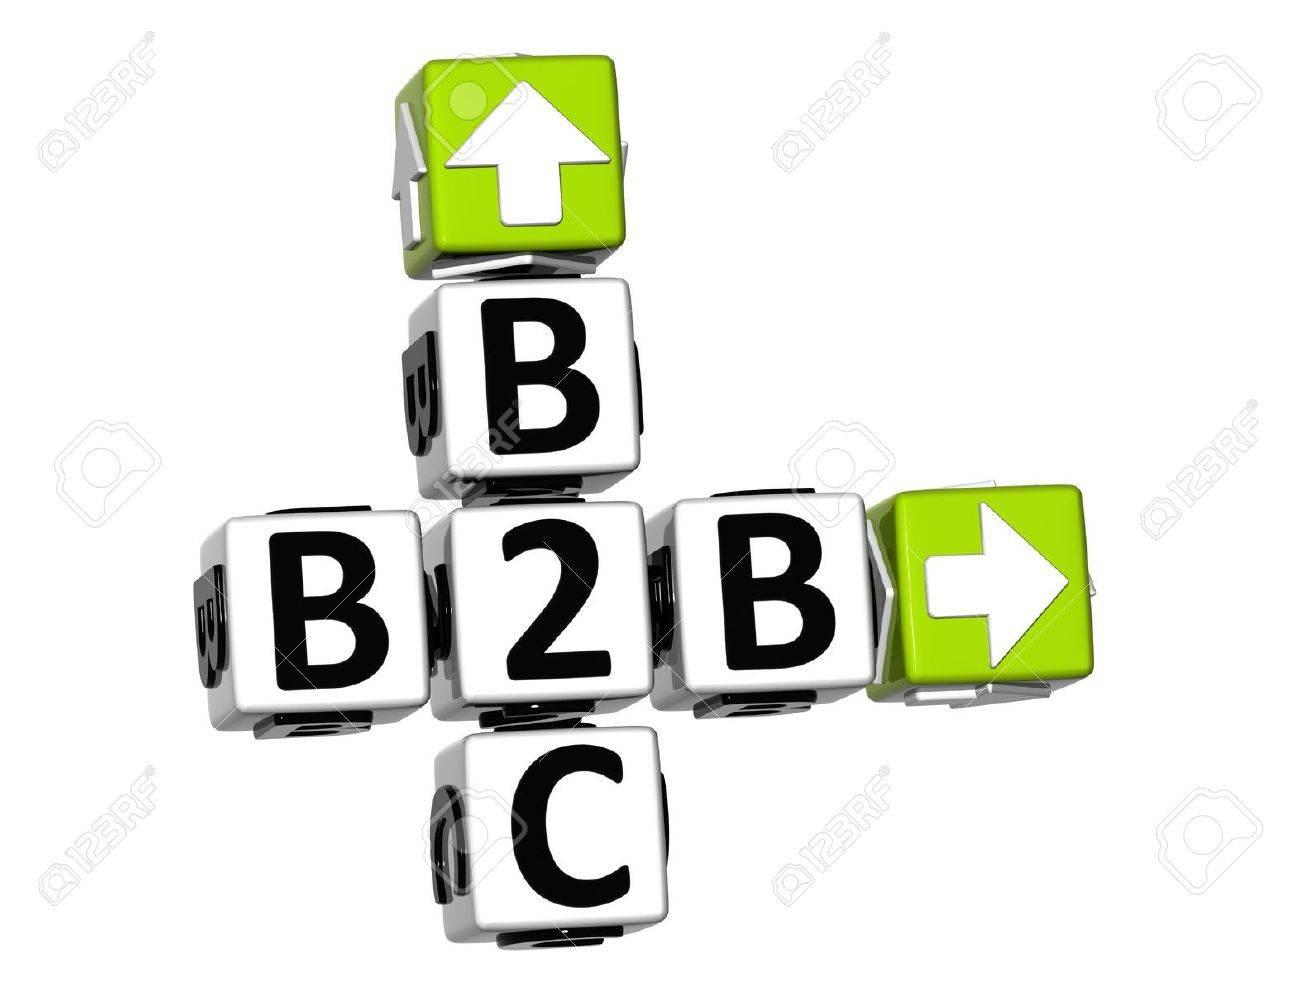 3D B2B B2C Crossword on white background - 19379339